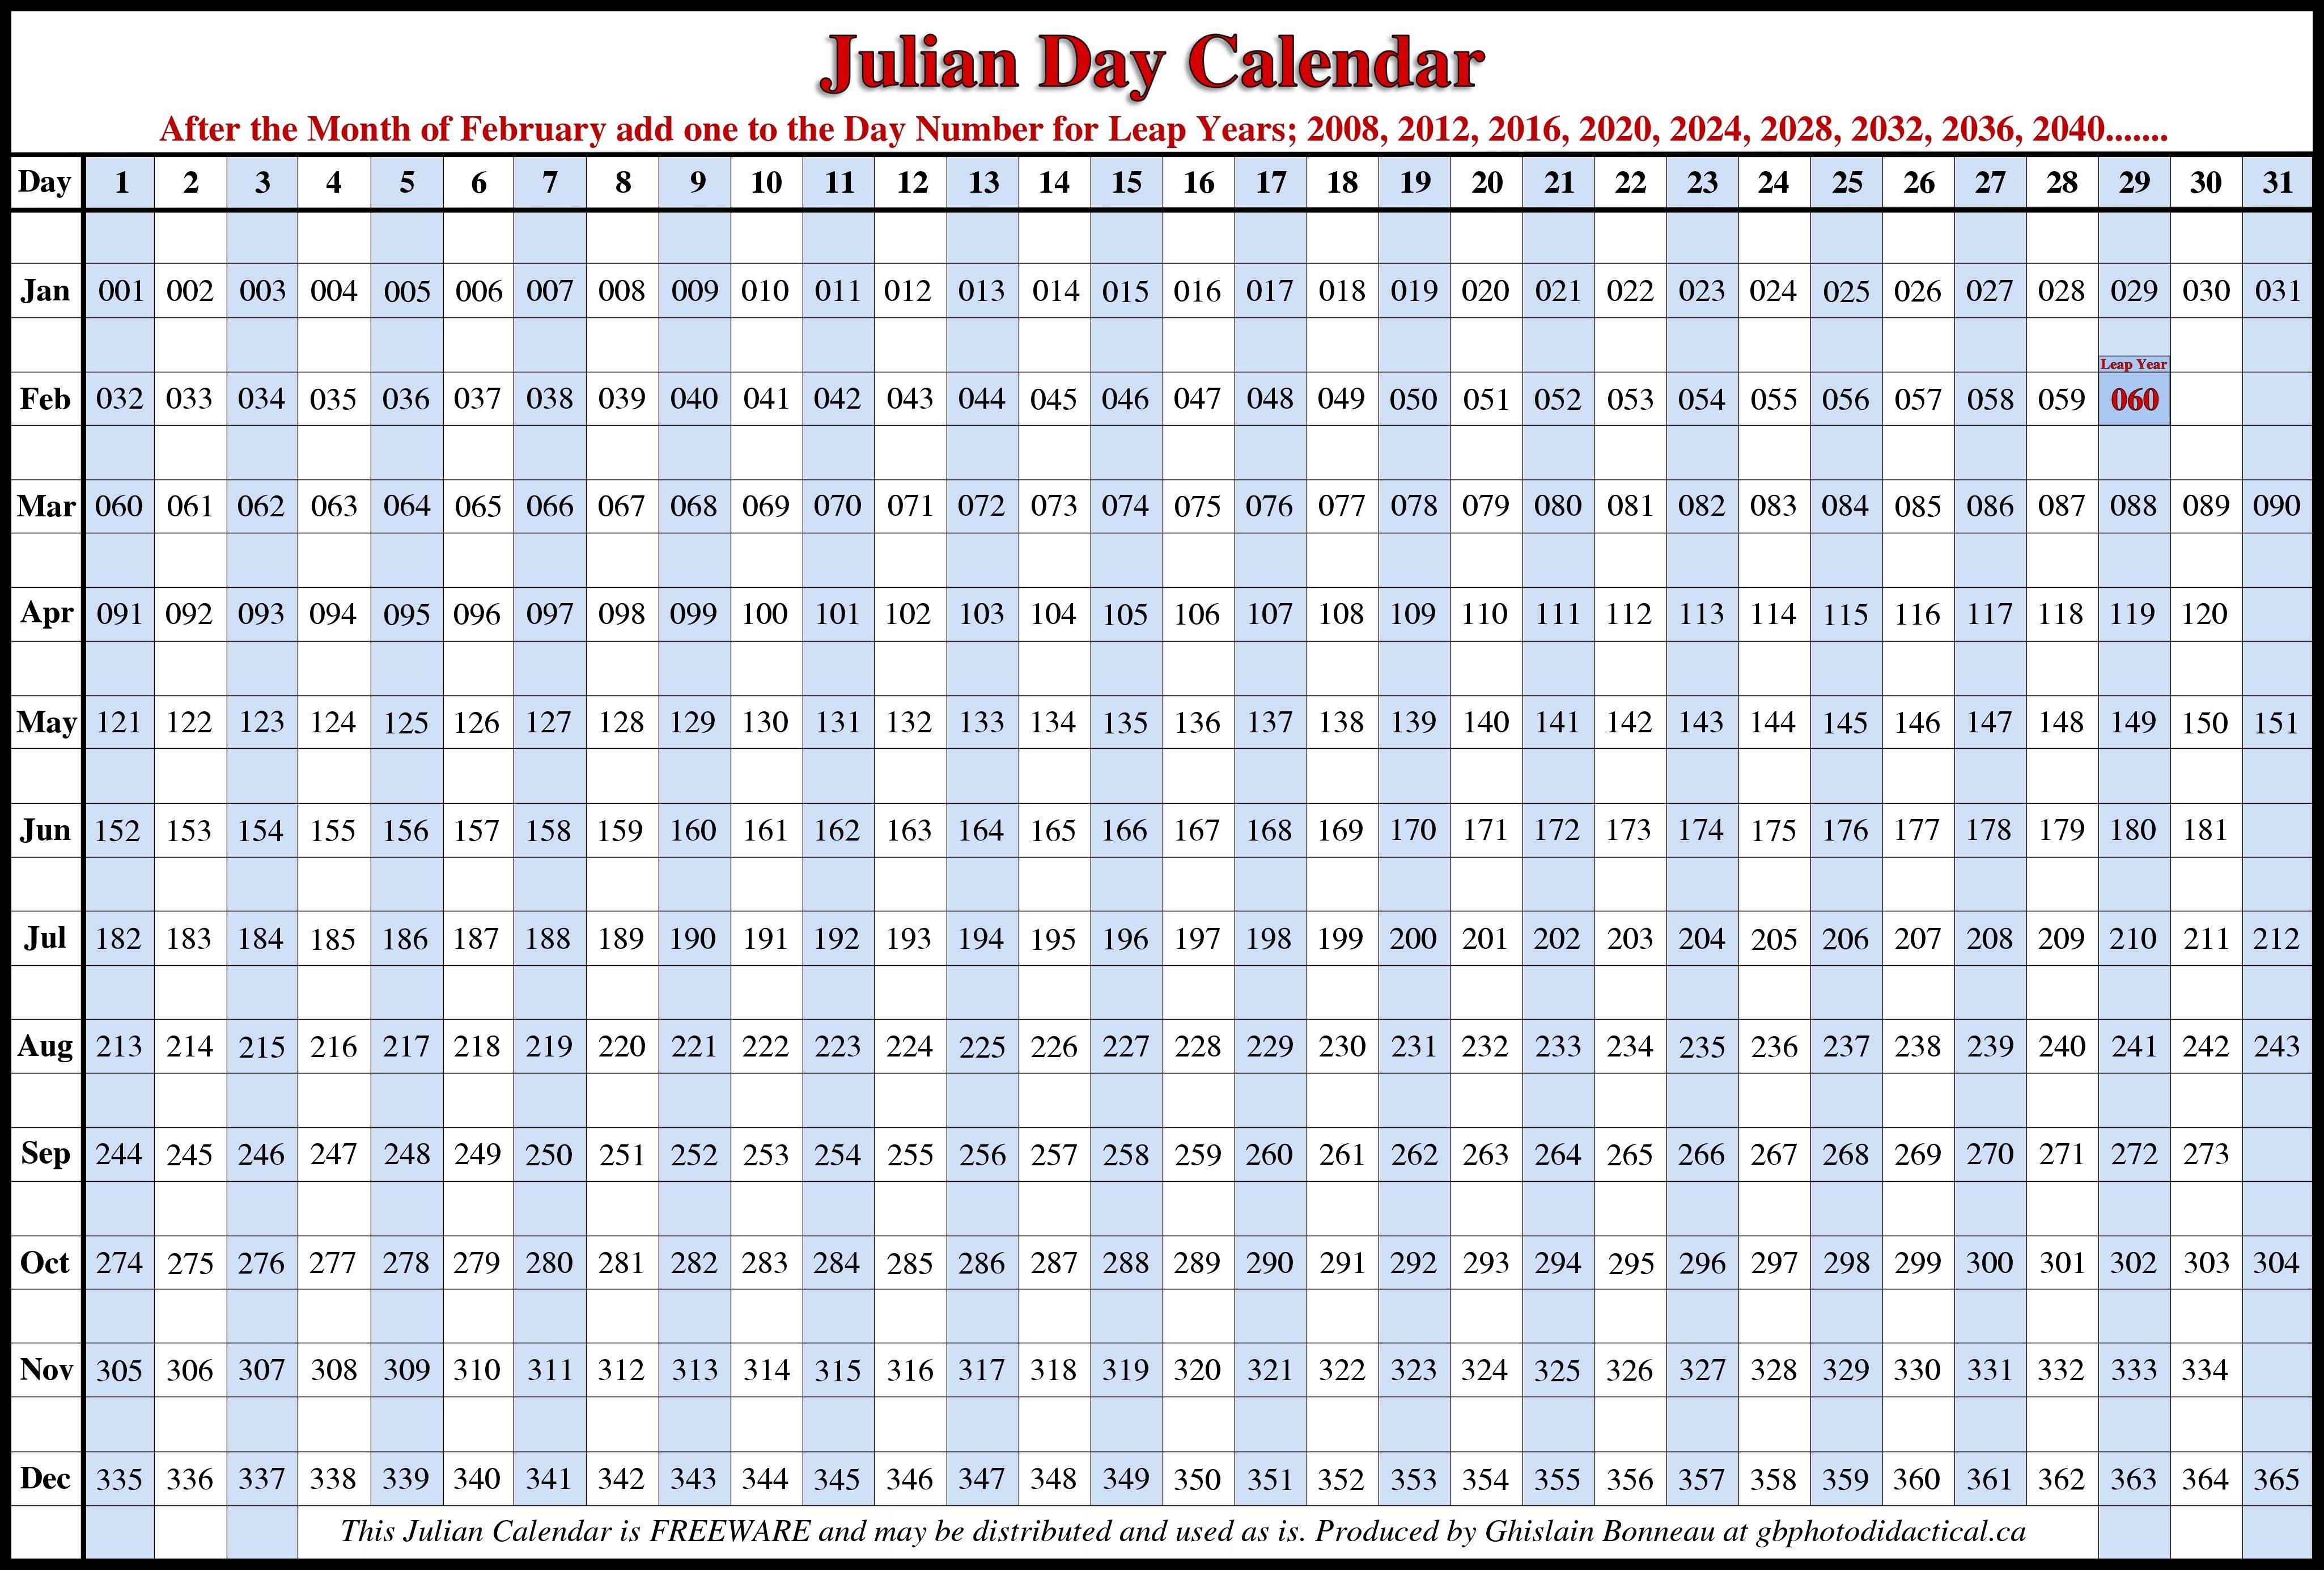 Julian Calendar 2018 Julian Calendar 2018 Julian Calendar